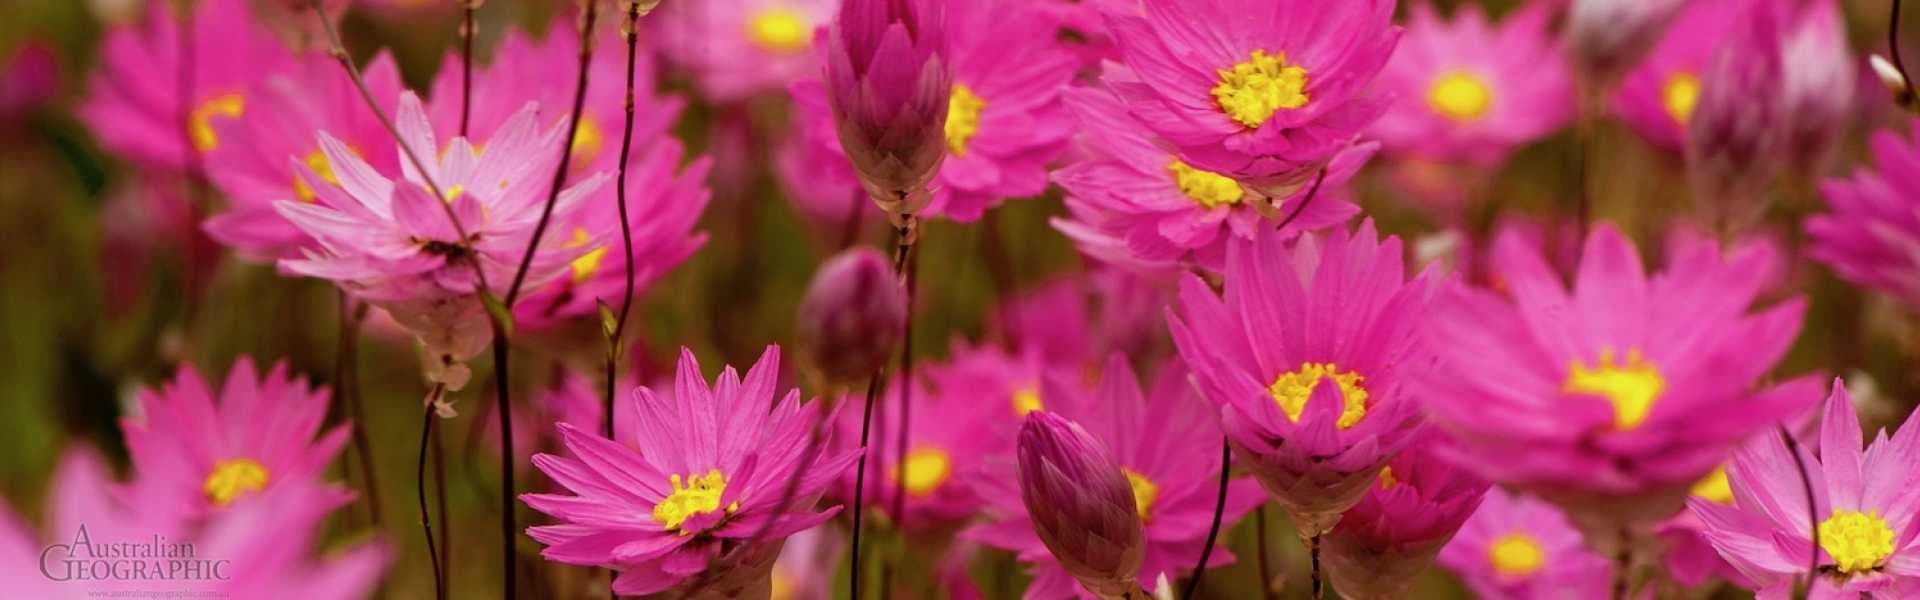 Kui Parks, Wongan Hills Caravan Park, Wild Flowers